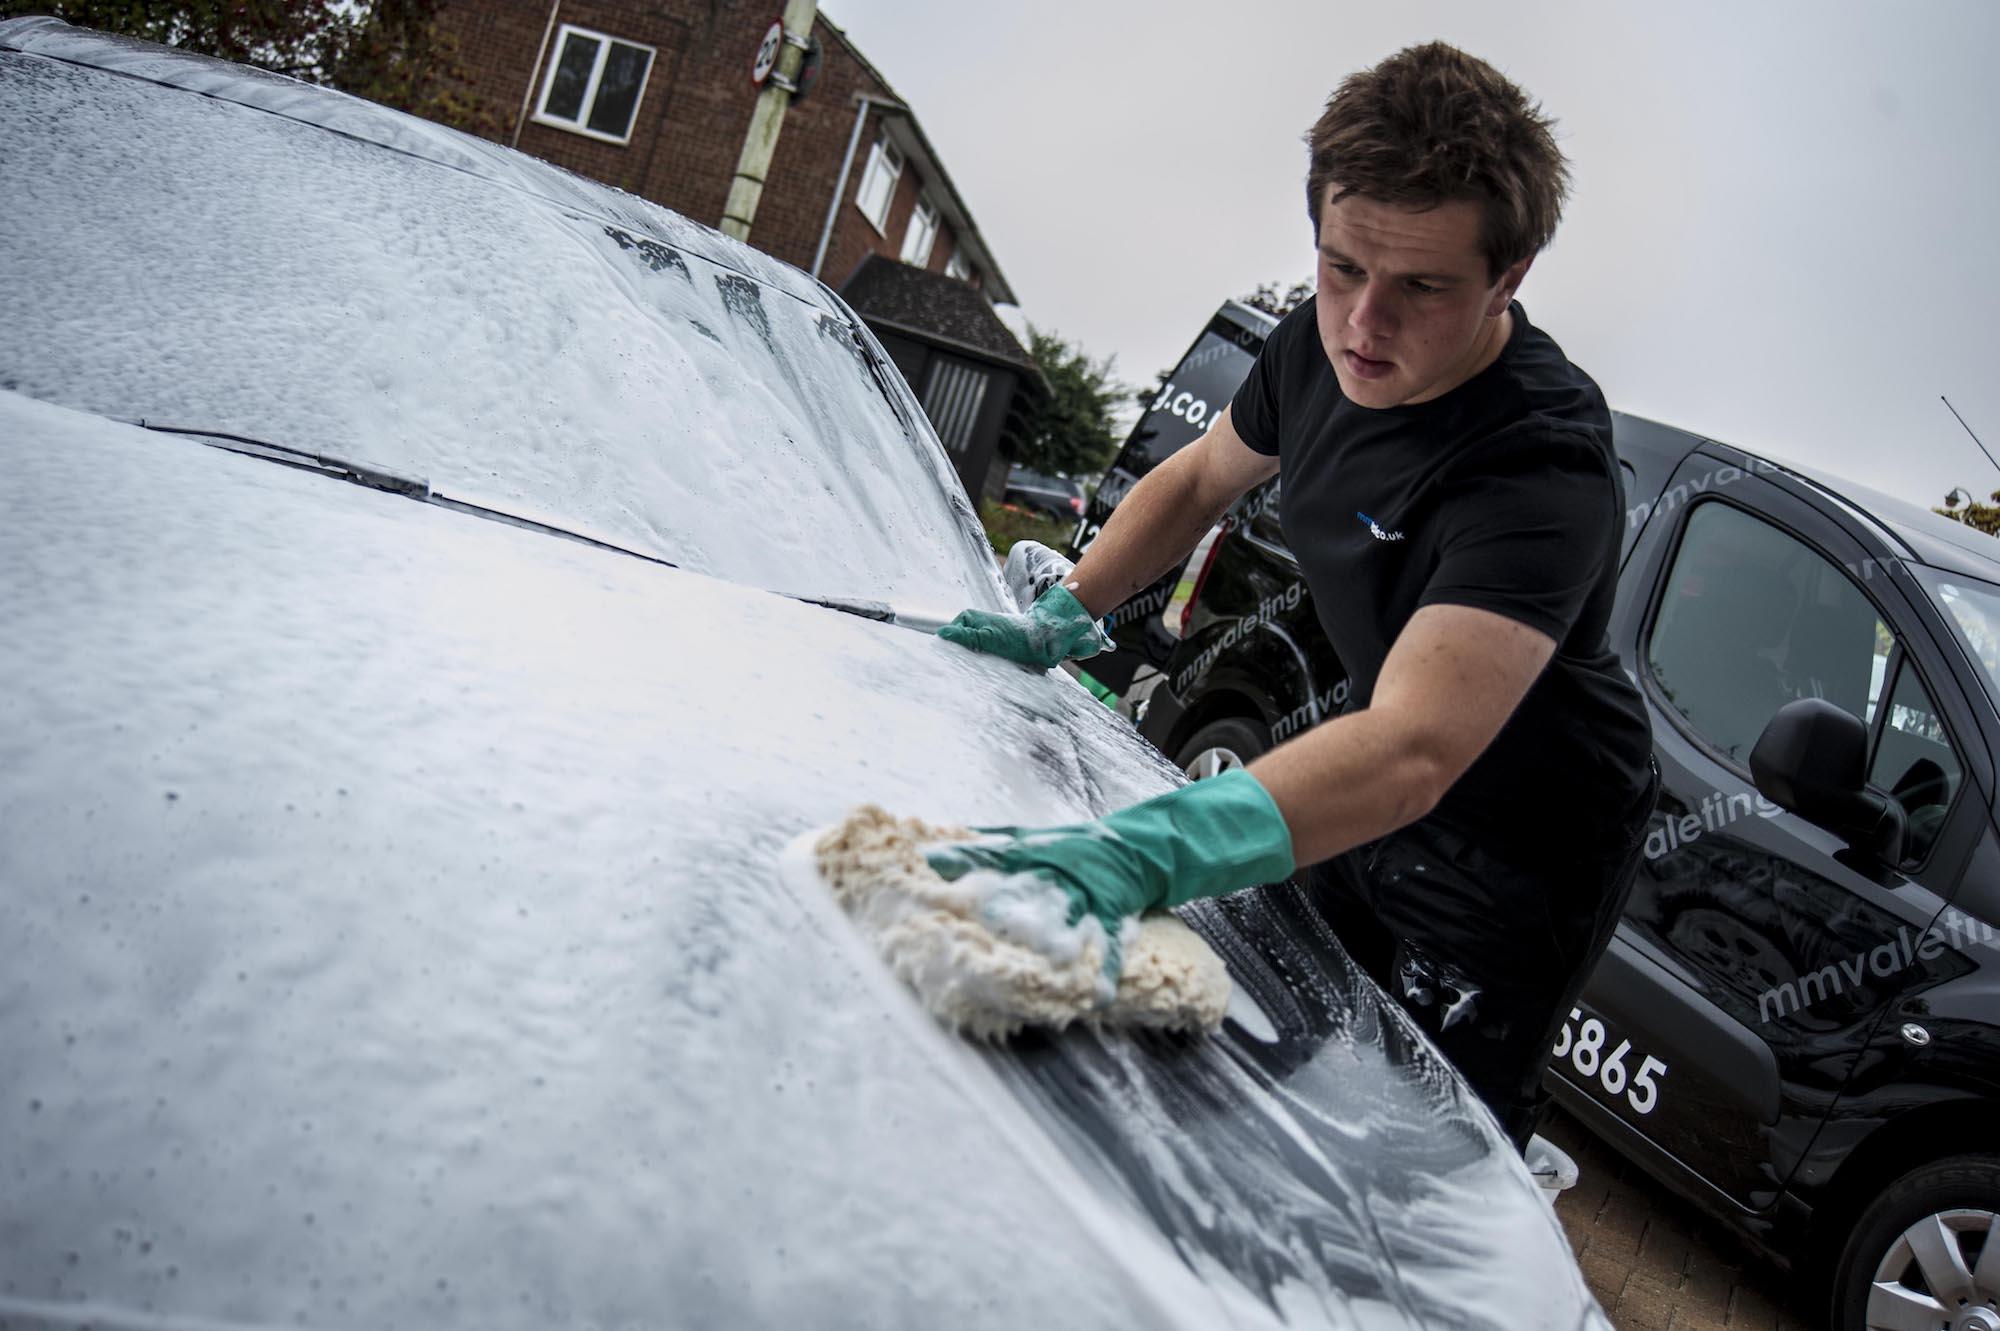 mmvaleting - Mobile car valeting and detailing in Buckinghamshire